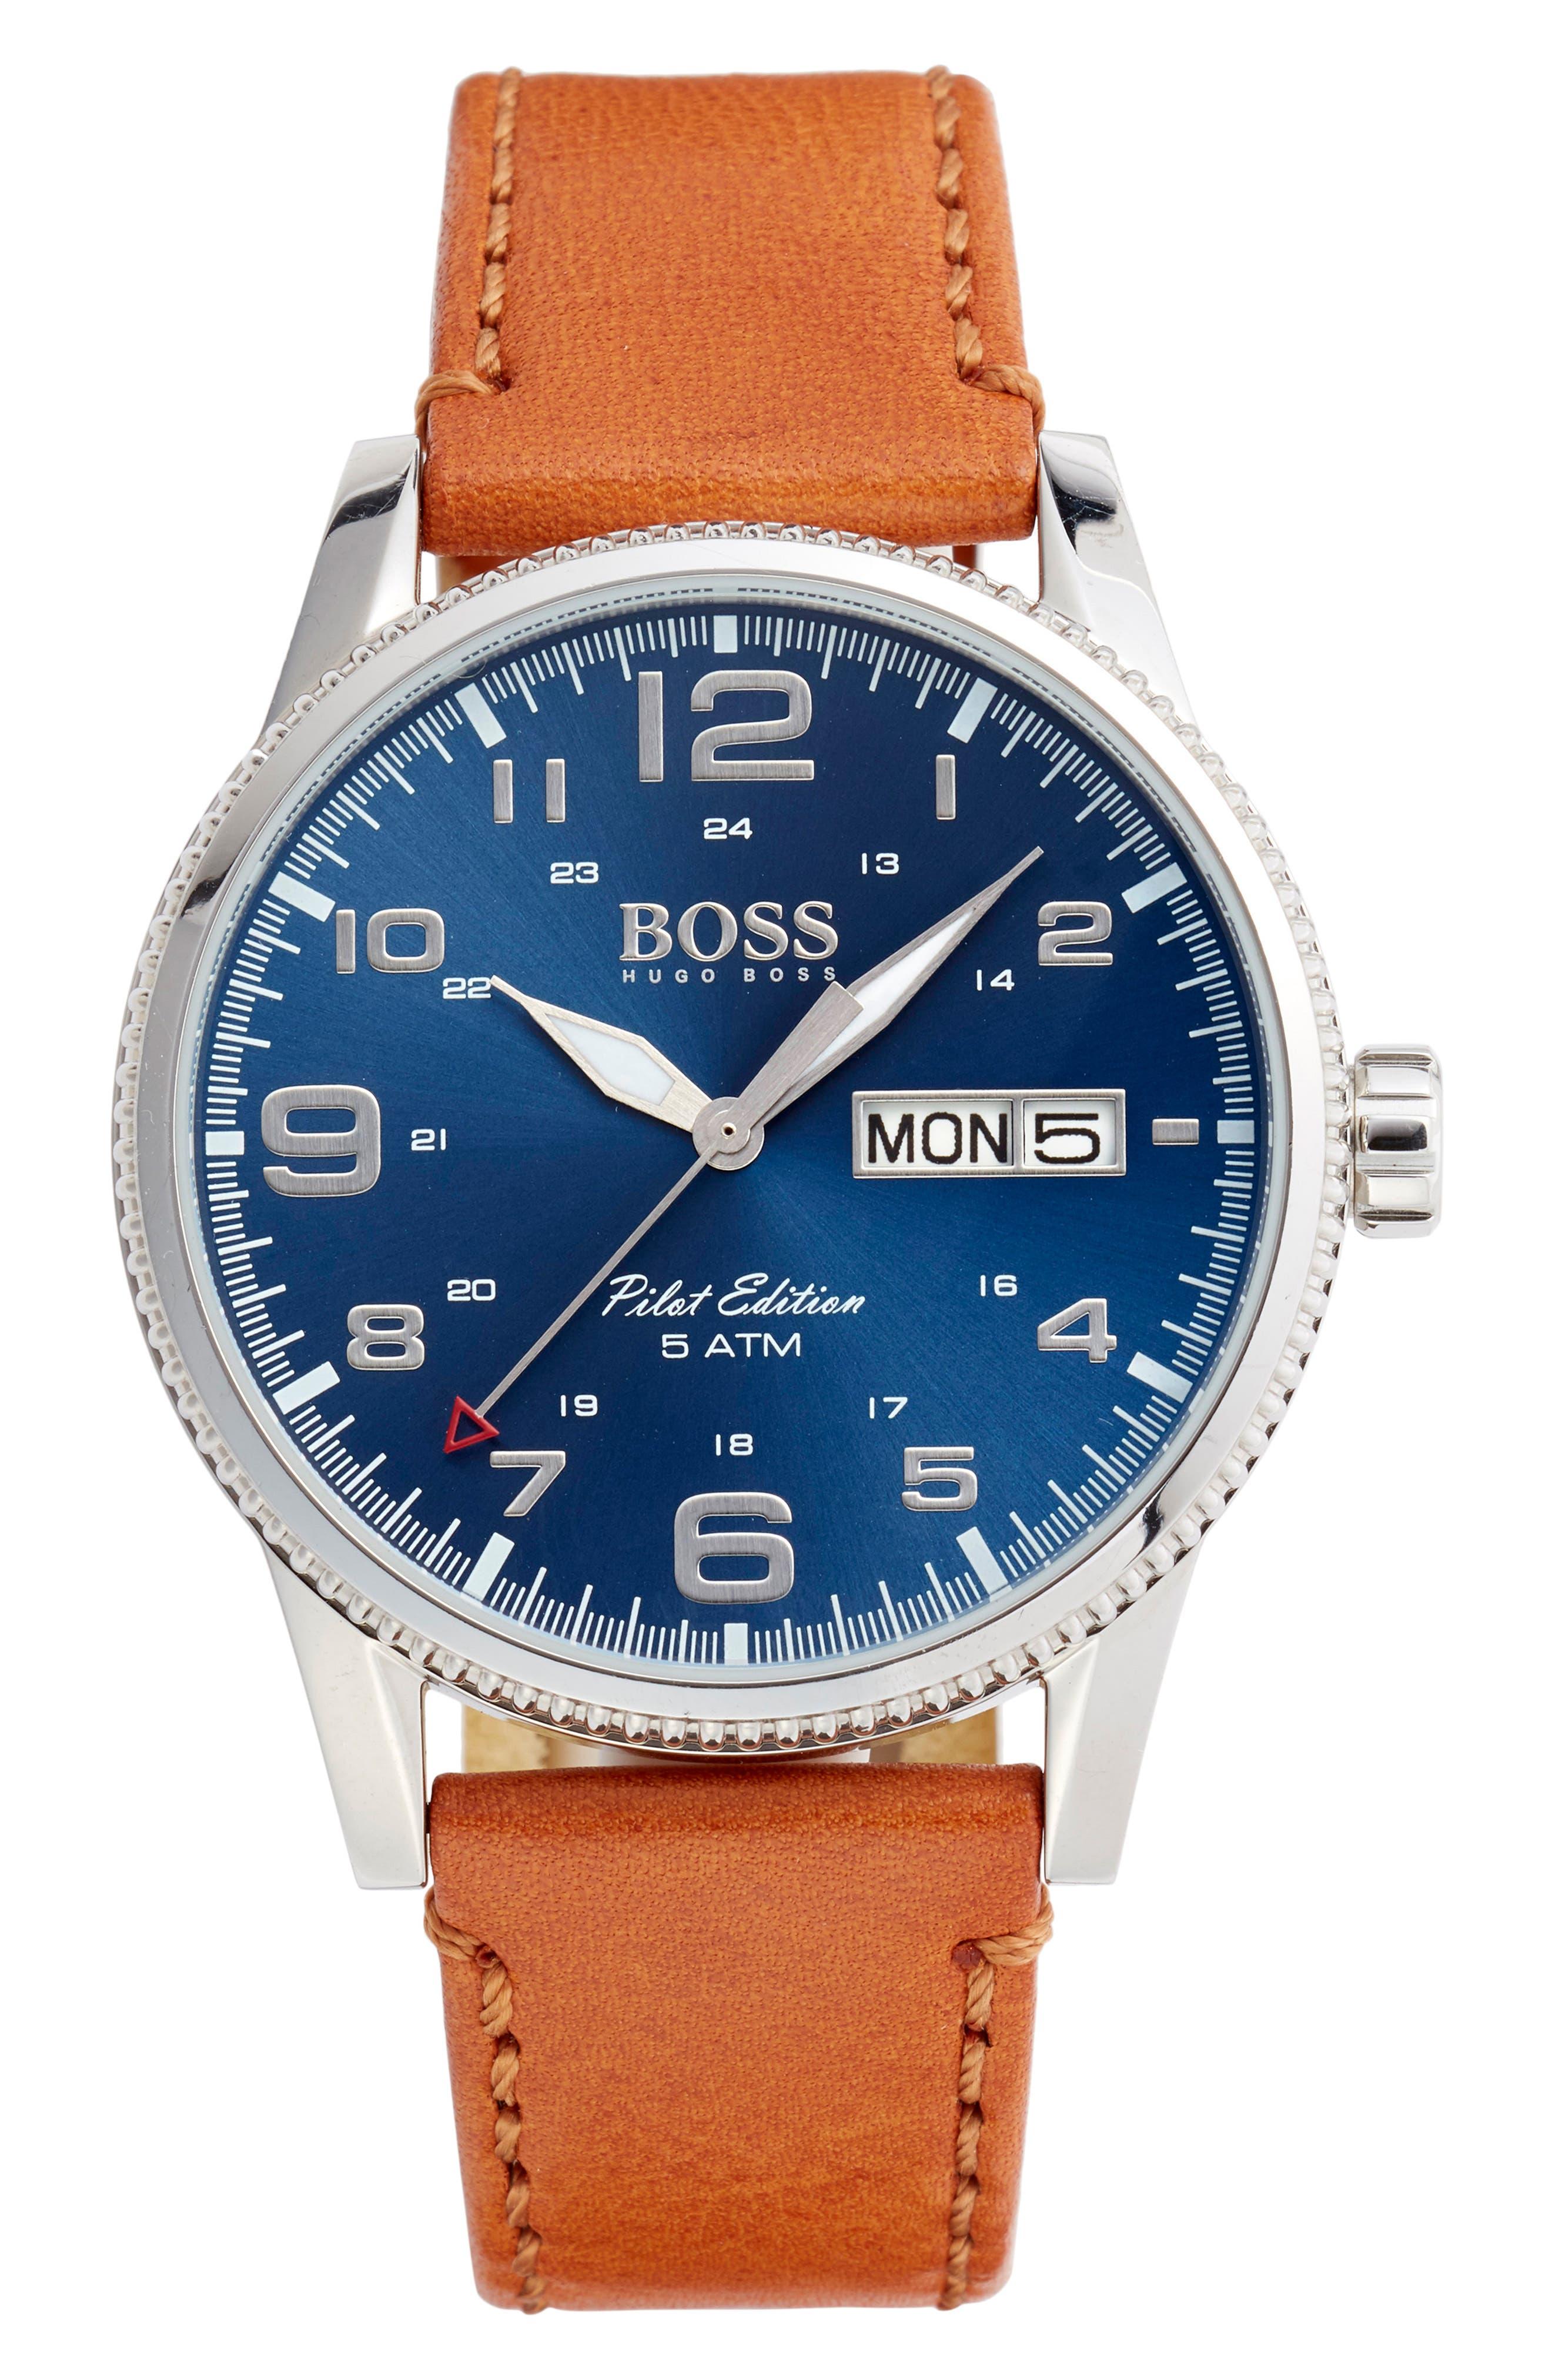 HUGO BOSS Pilot Vintage Leather Strap Watch, Main, color, BROWN/ BLUE/ SILVER